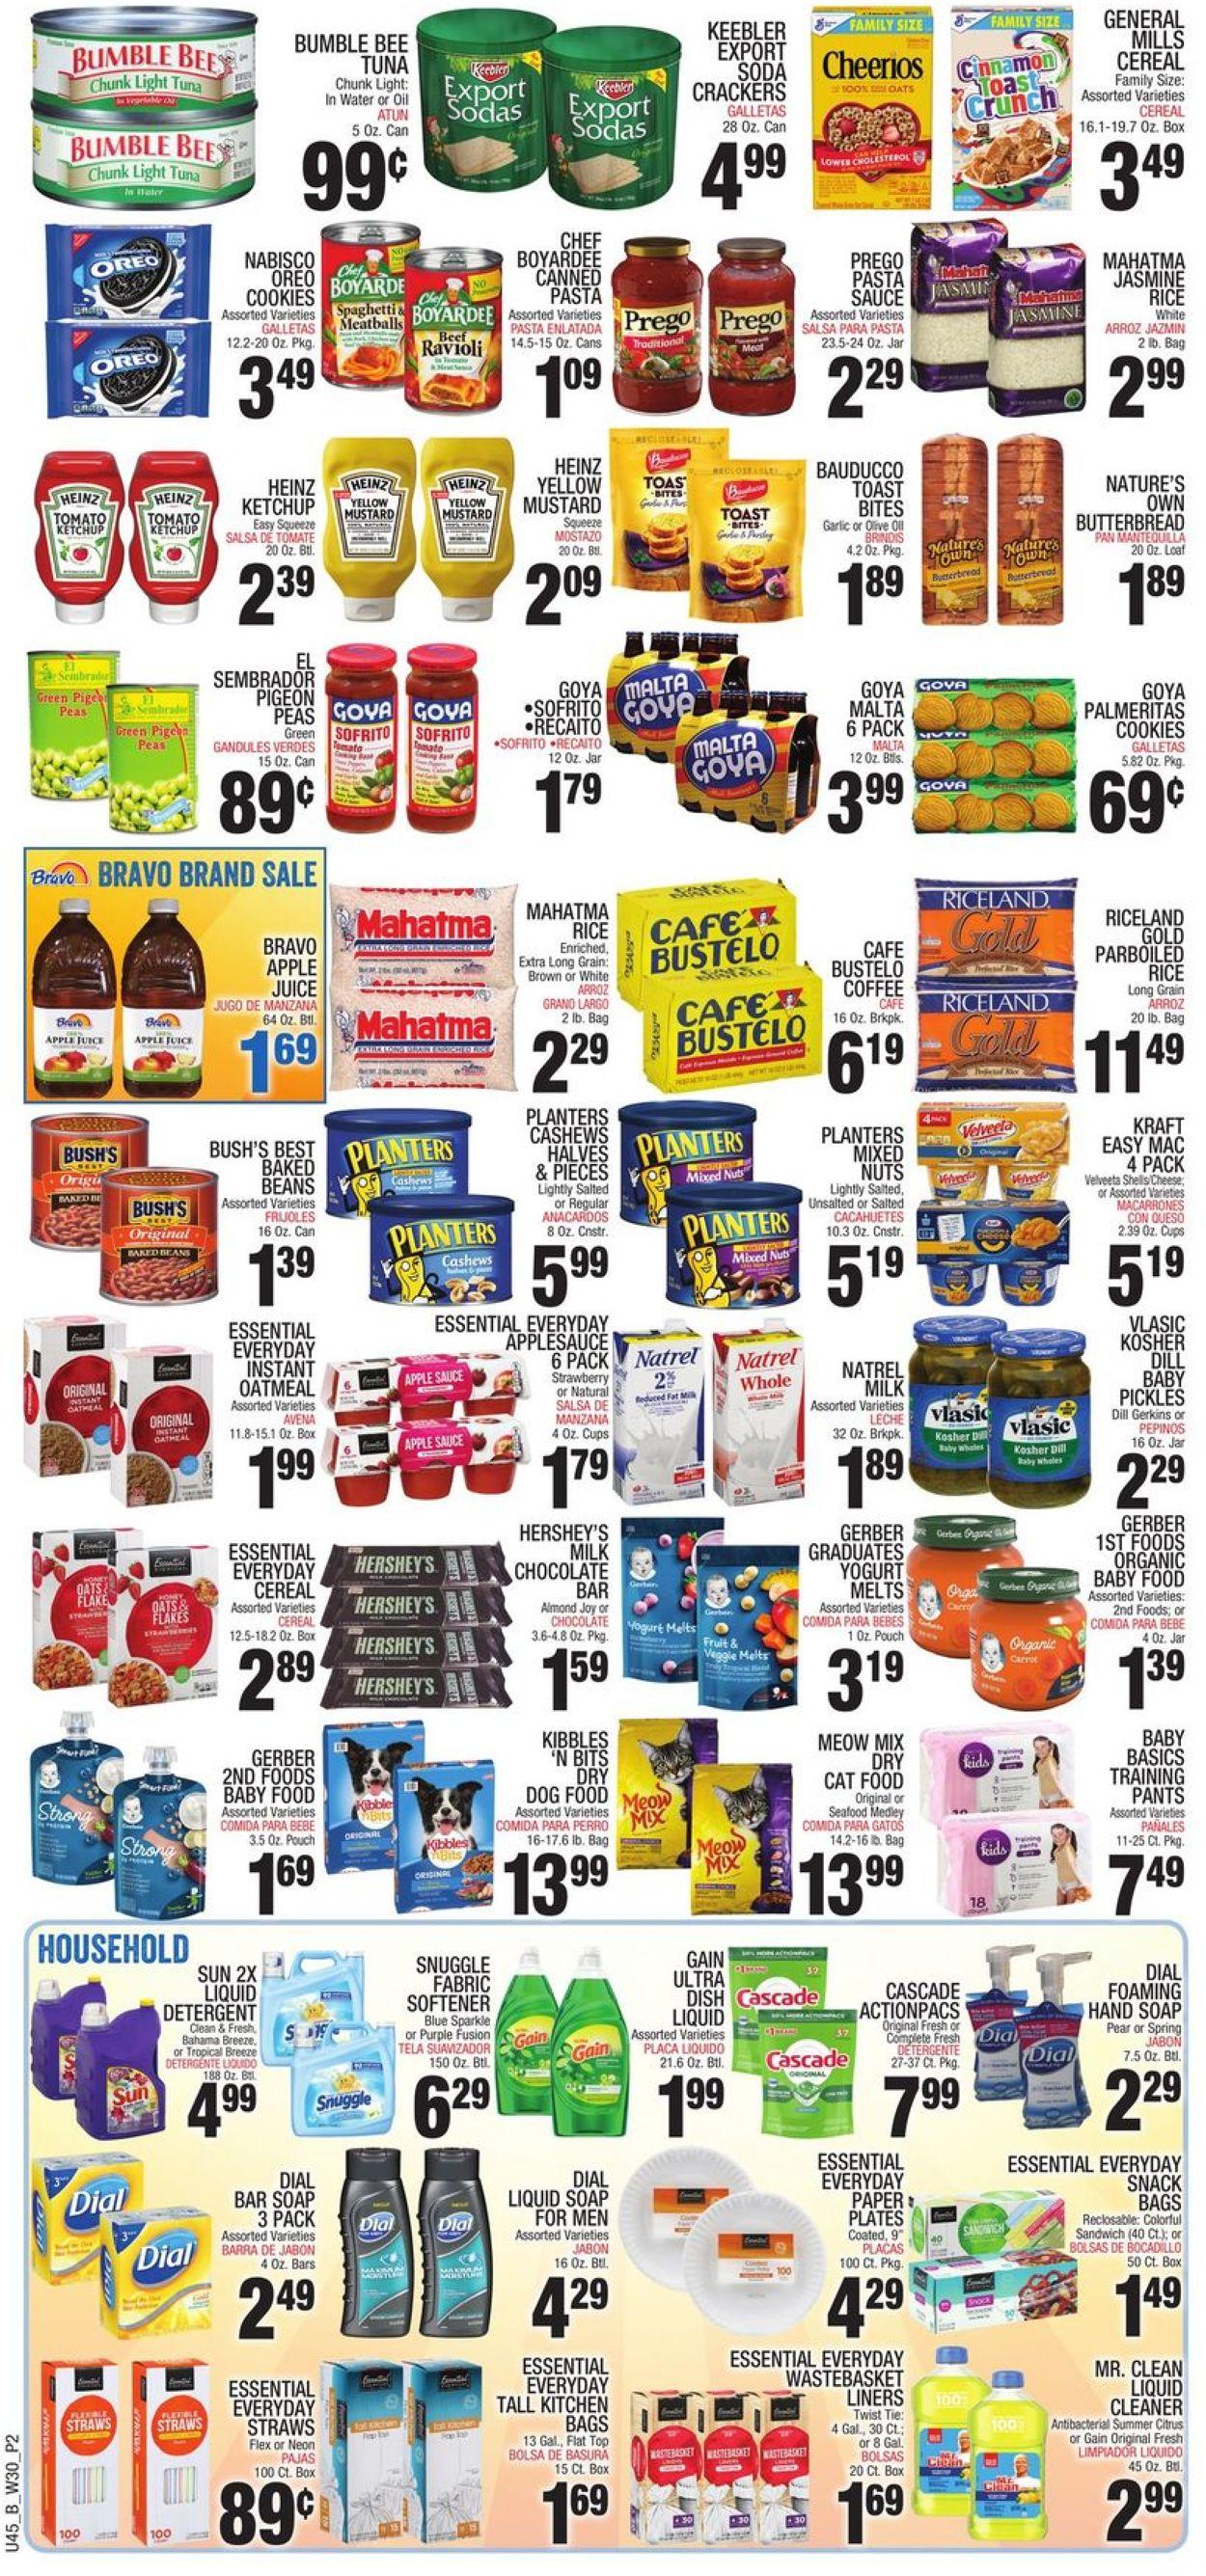 Bravo Supermarkets Weekly Ad Circular - valid 07/22-07/28/2021 (Page 2)